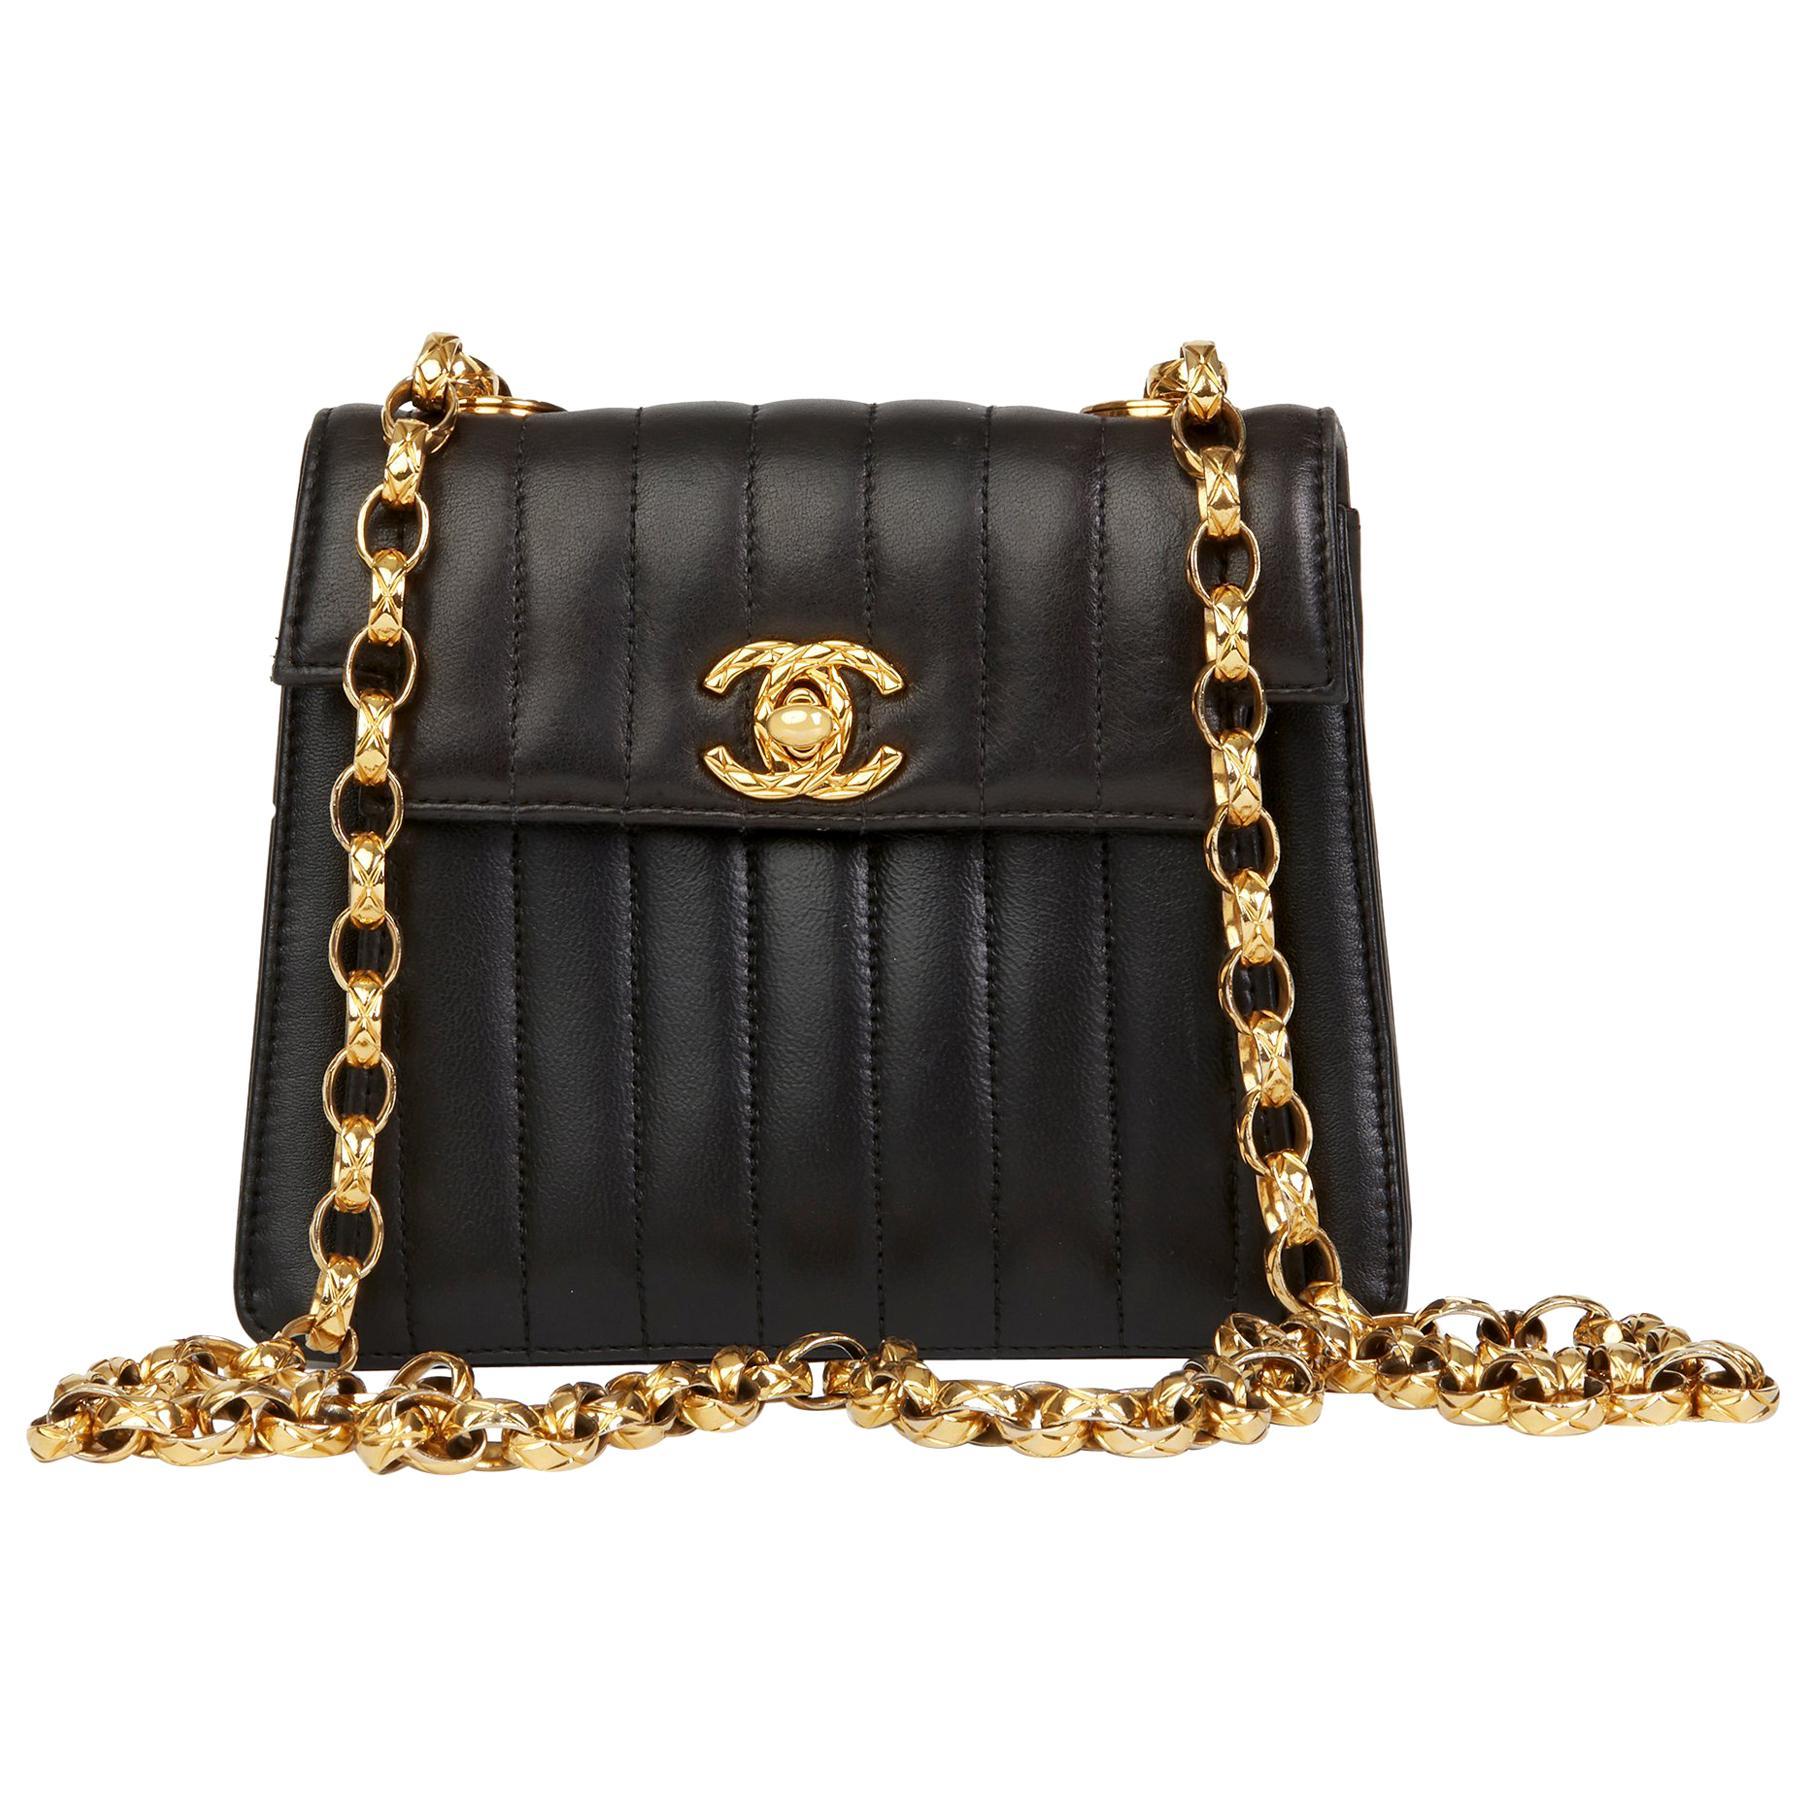 6740b622c7c7 1991 Chanel Black Vertical Quilted Lambskin Vintage Mini Flap Bag at 1stdibs